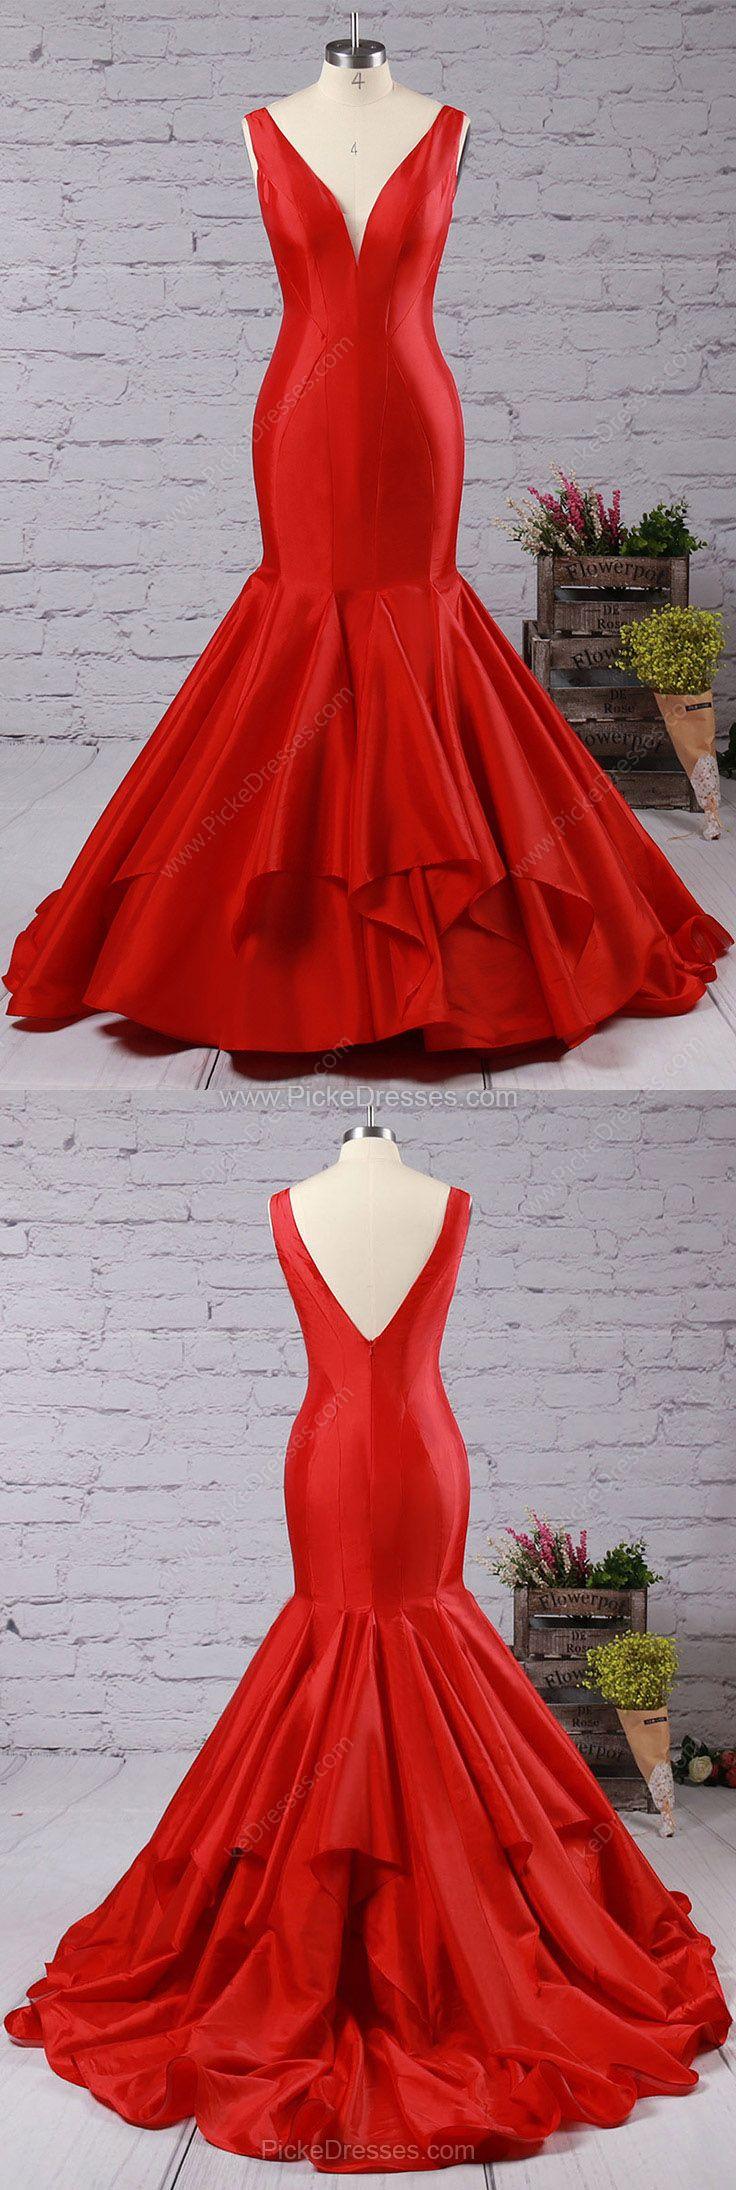 Red Prom Dresses,Long Prom Dresses For Teens,Cheap Prom Dresses 2018,Trumpet/Mermaid Prom Dresses V-neck, Taffeta Prom Dresses with Ruffles